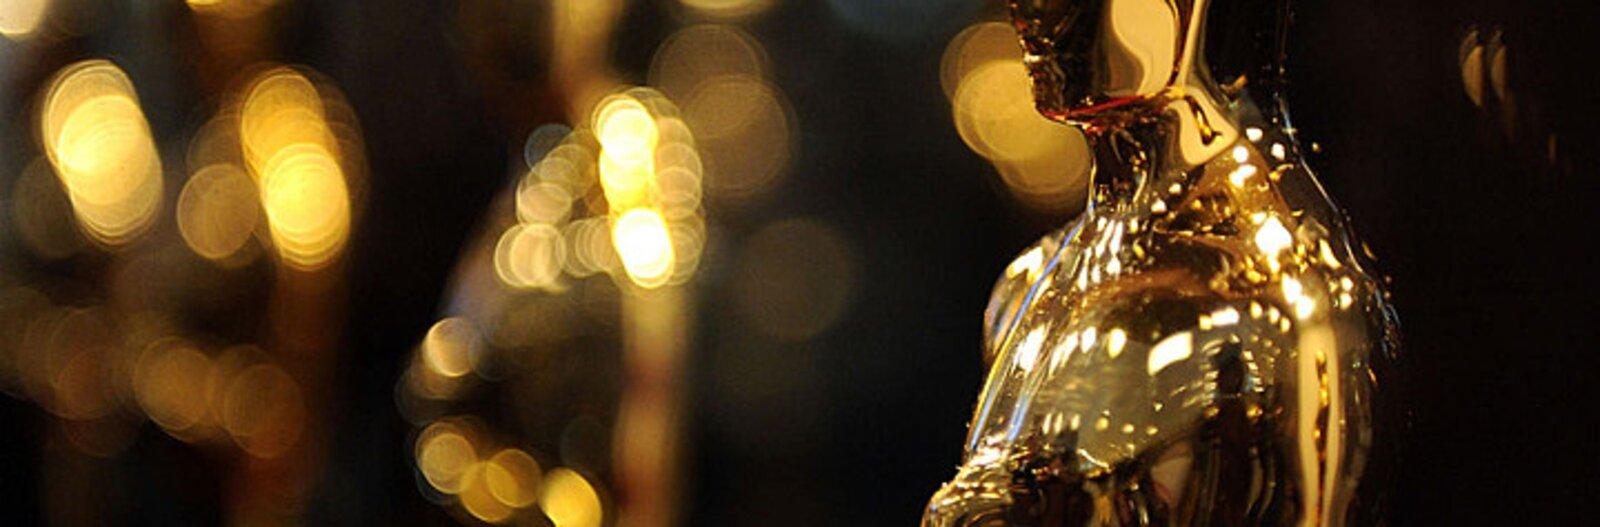 Kvíz, pop-corn, Saul fia – 5 Oscar-néző buli vasárnapra